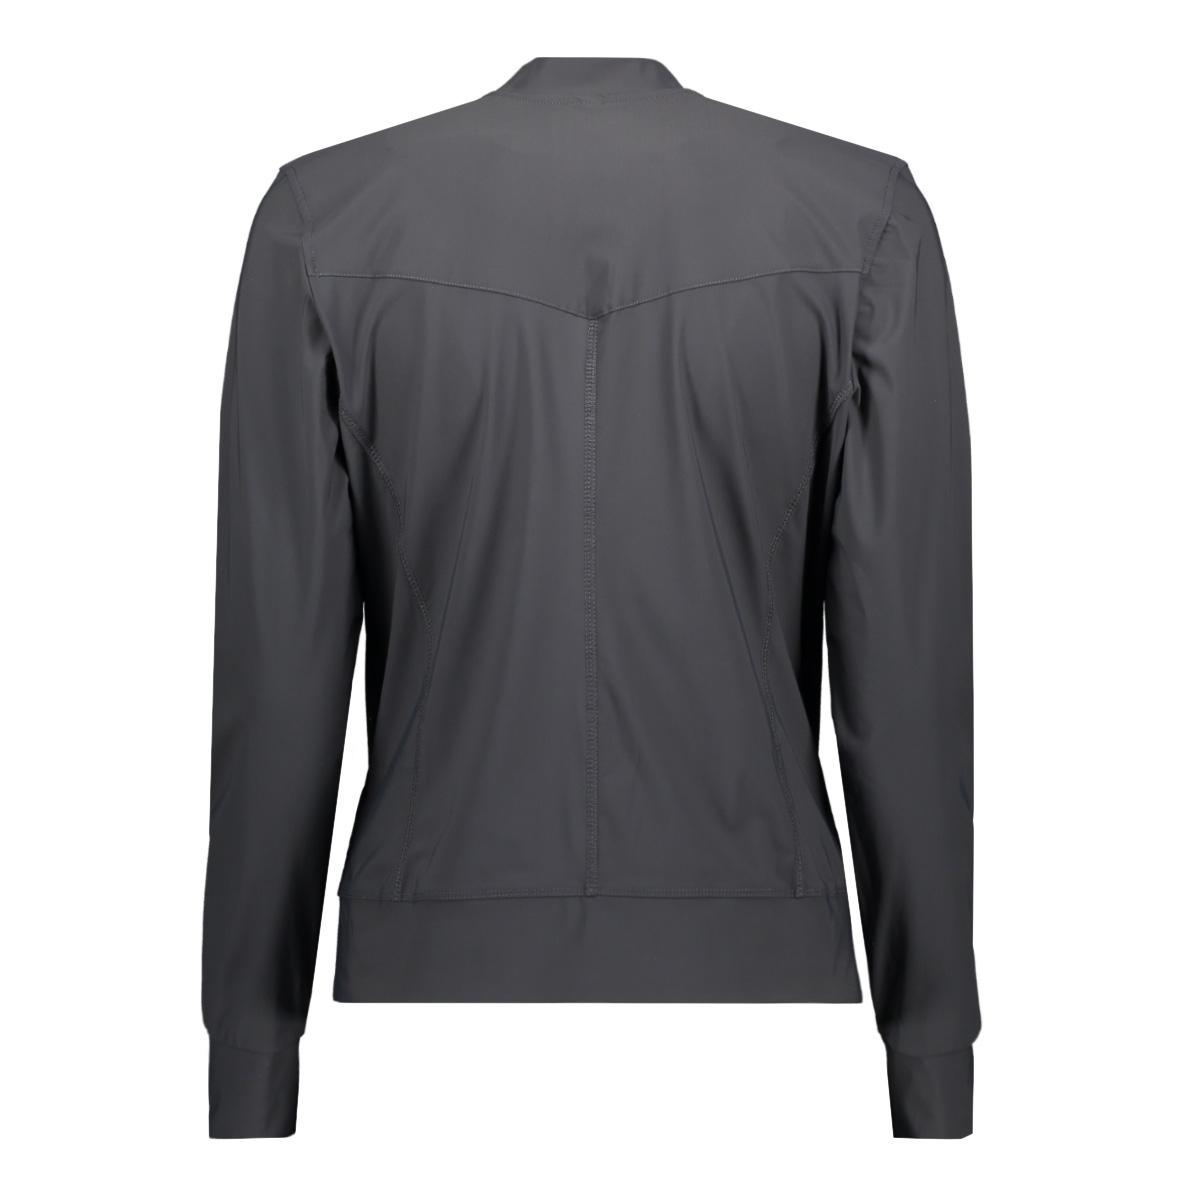 201 gina travel jacket zoso blazer 0059 charcoal